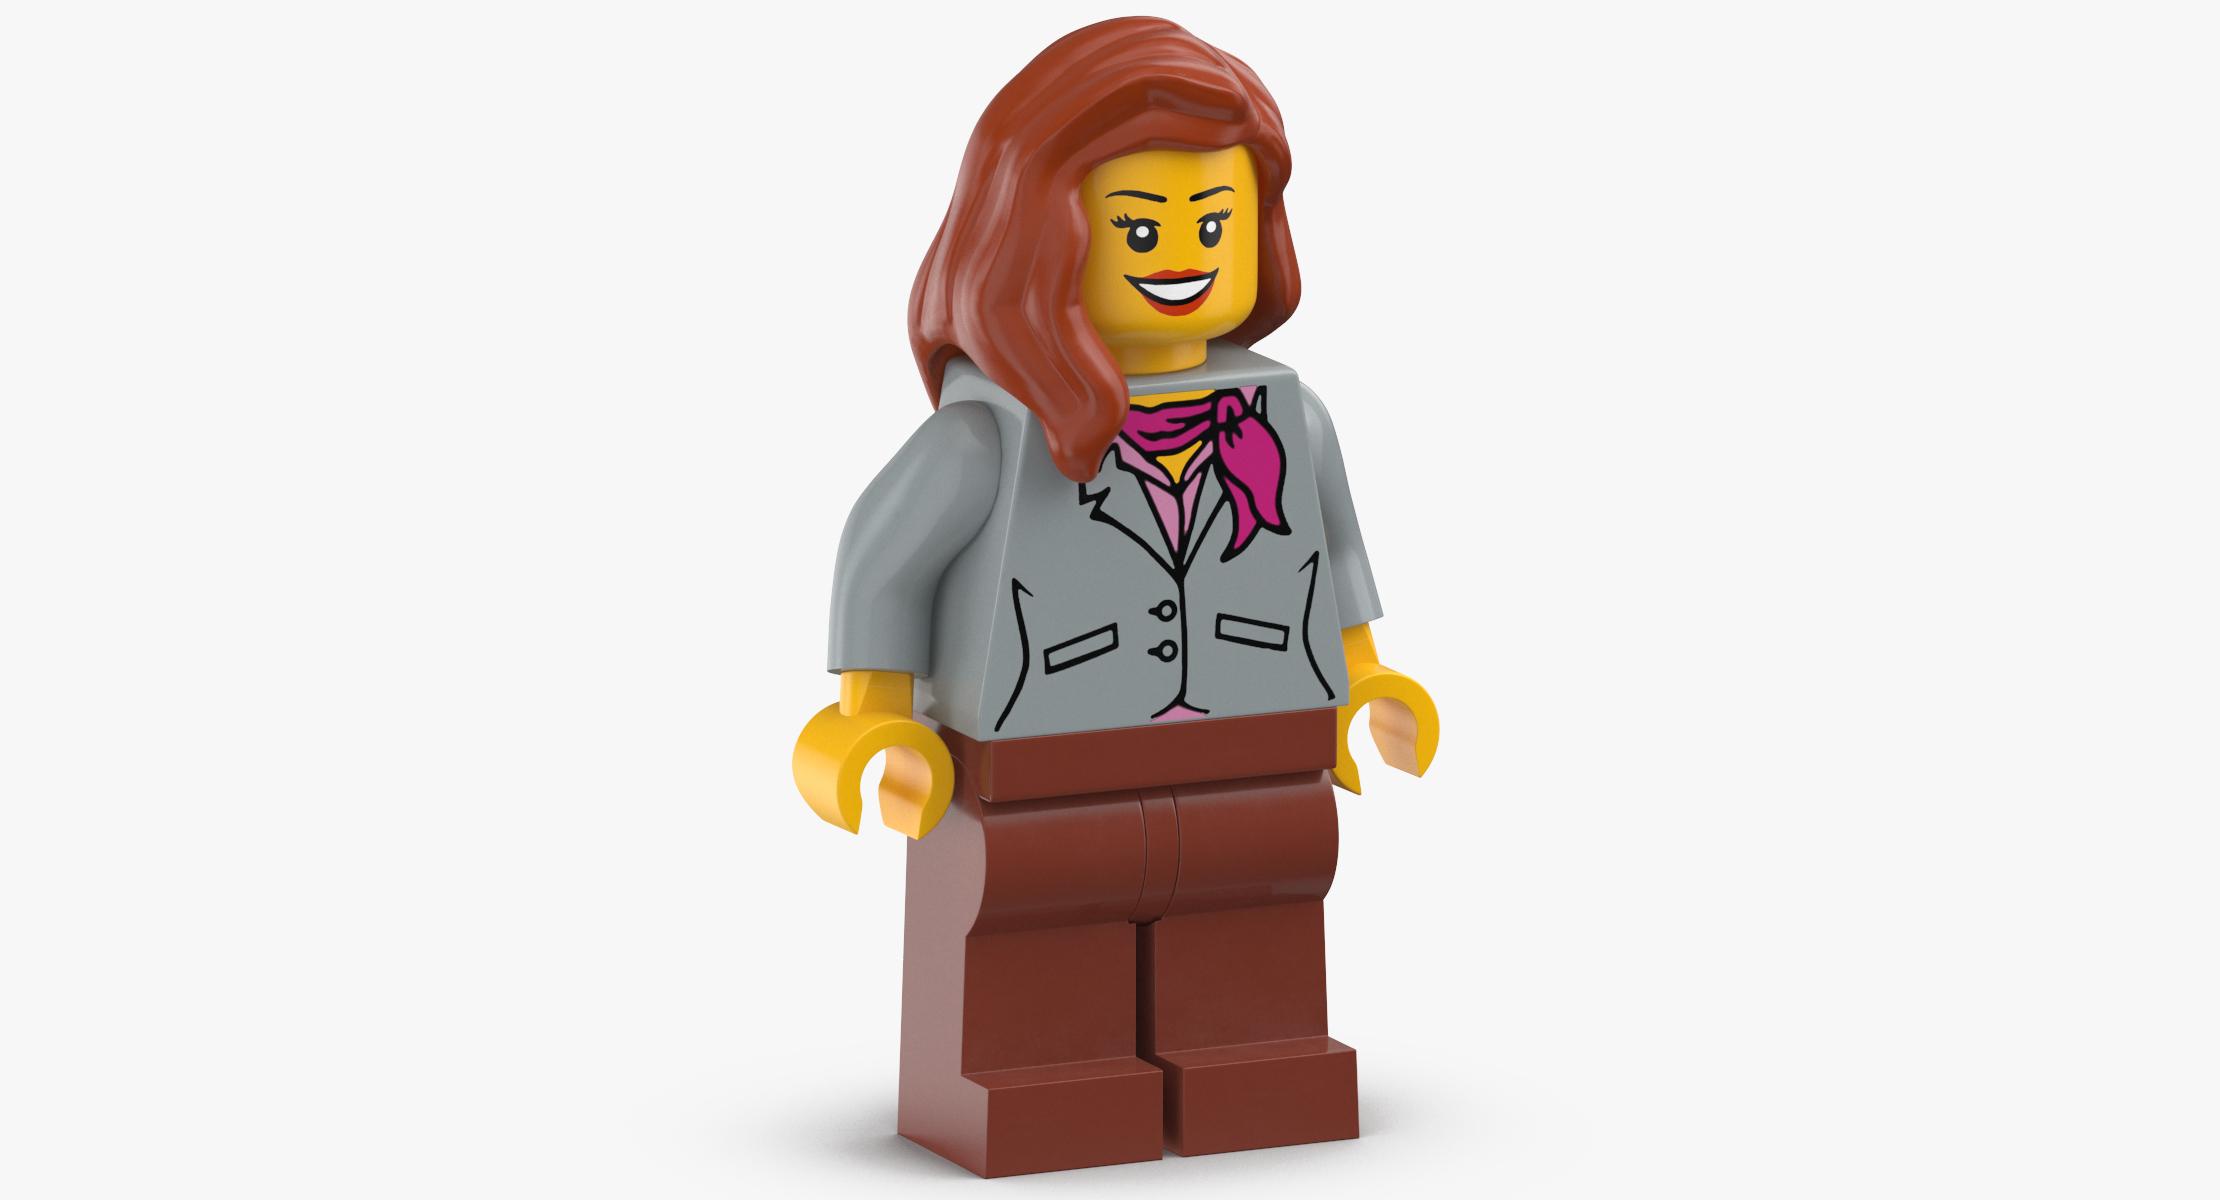 LEGO Woman in Bright Light Blue Sweater Minifigure   Brick